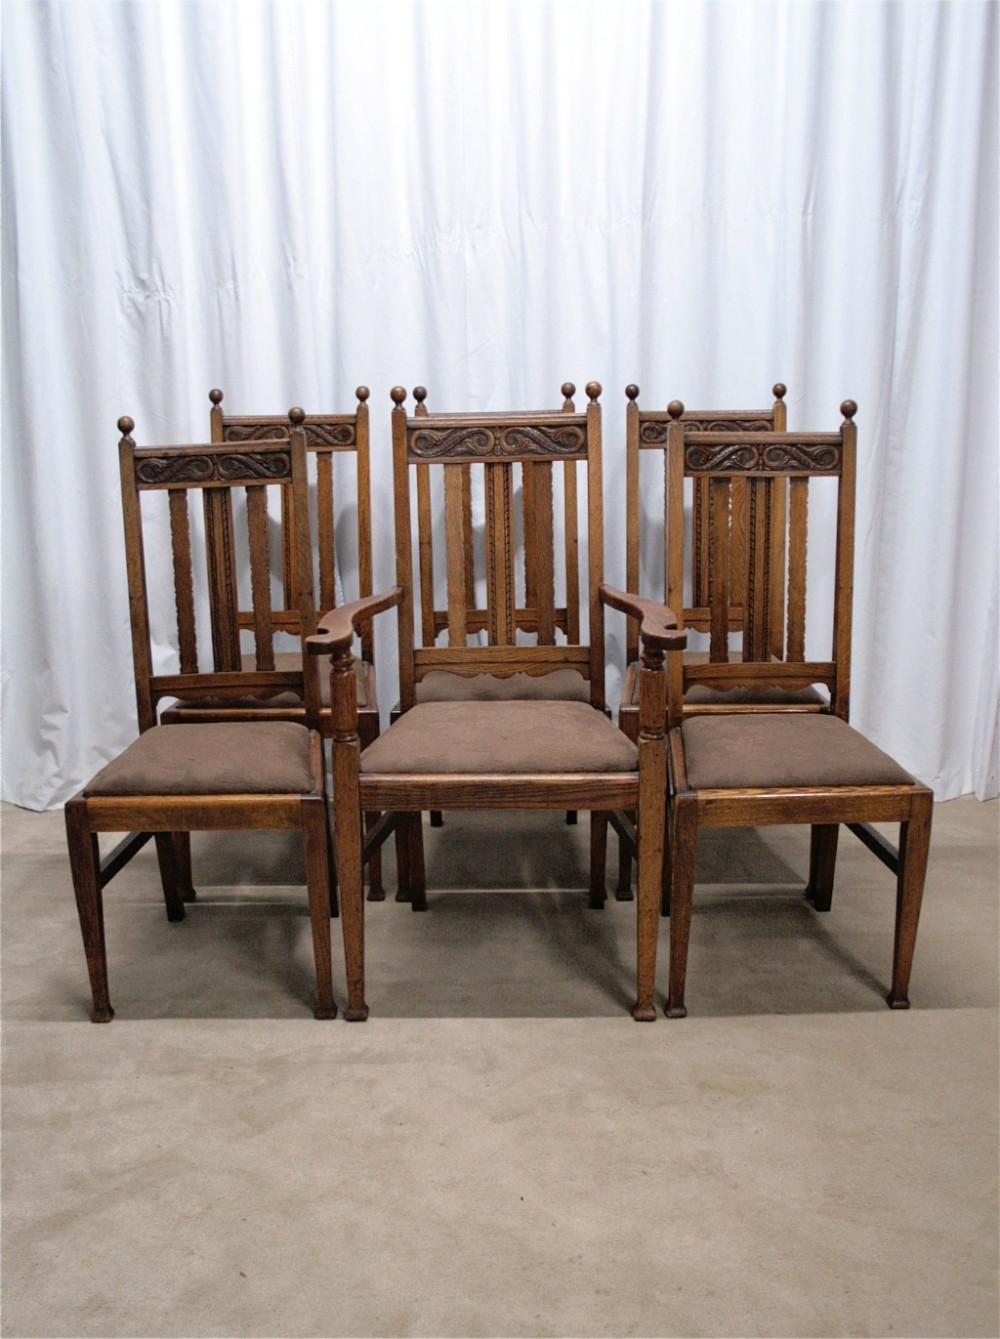 six edwardian oak dining chairs - Six Edwardian Oak Dining Chairs 258759 Sellingantiques.co.uk